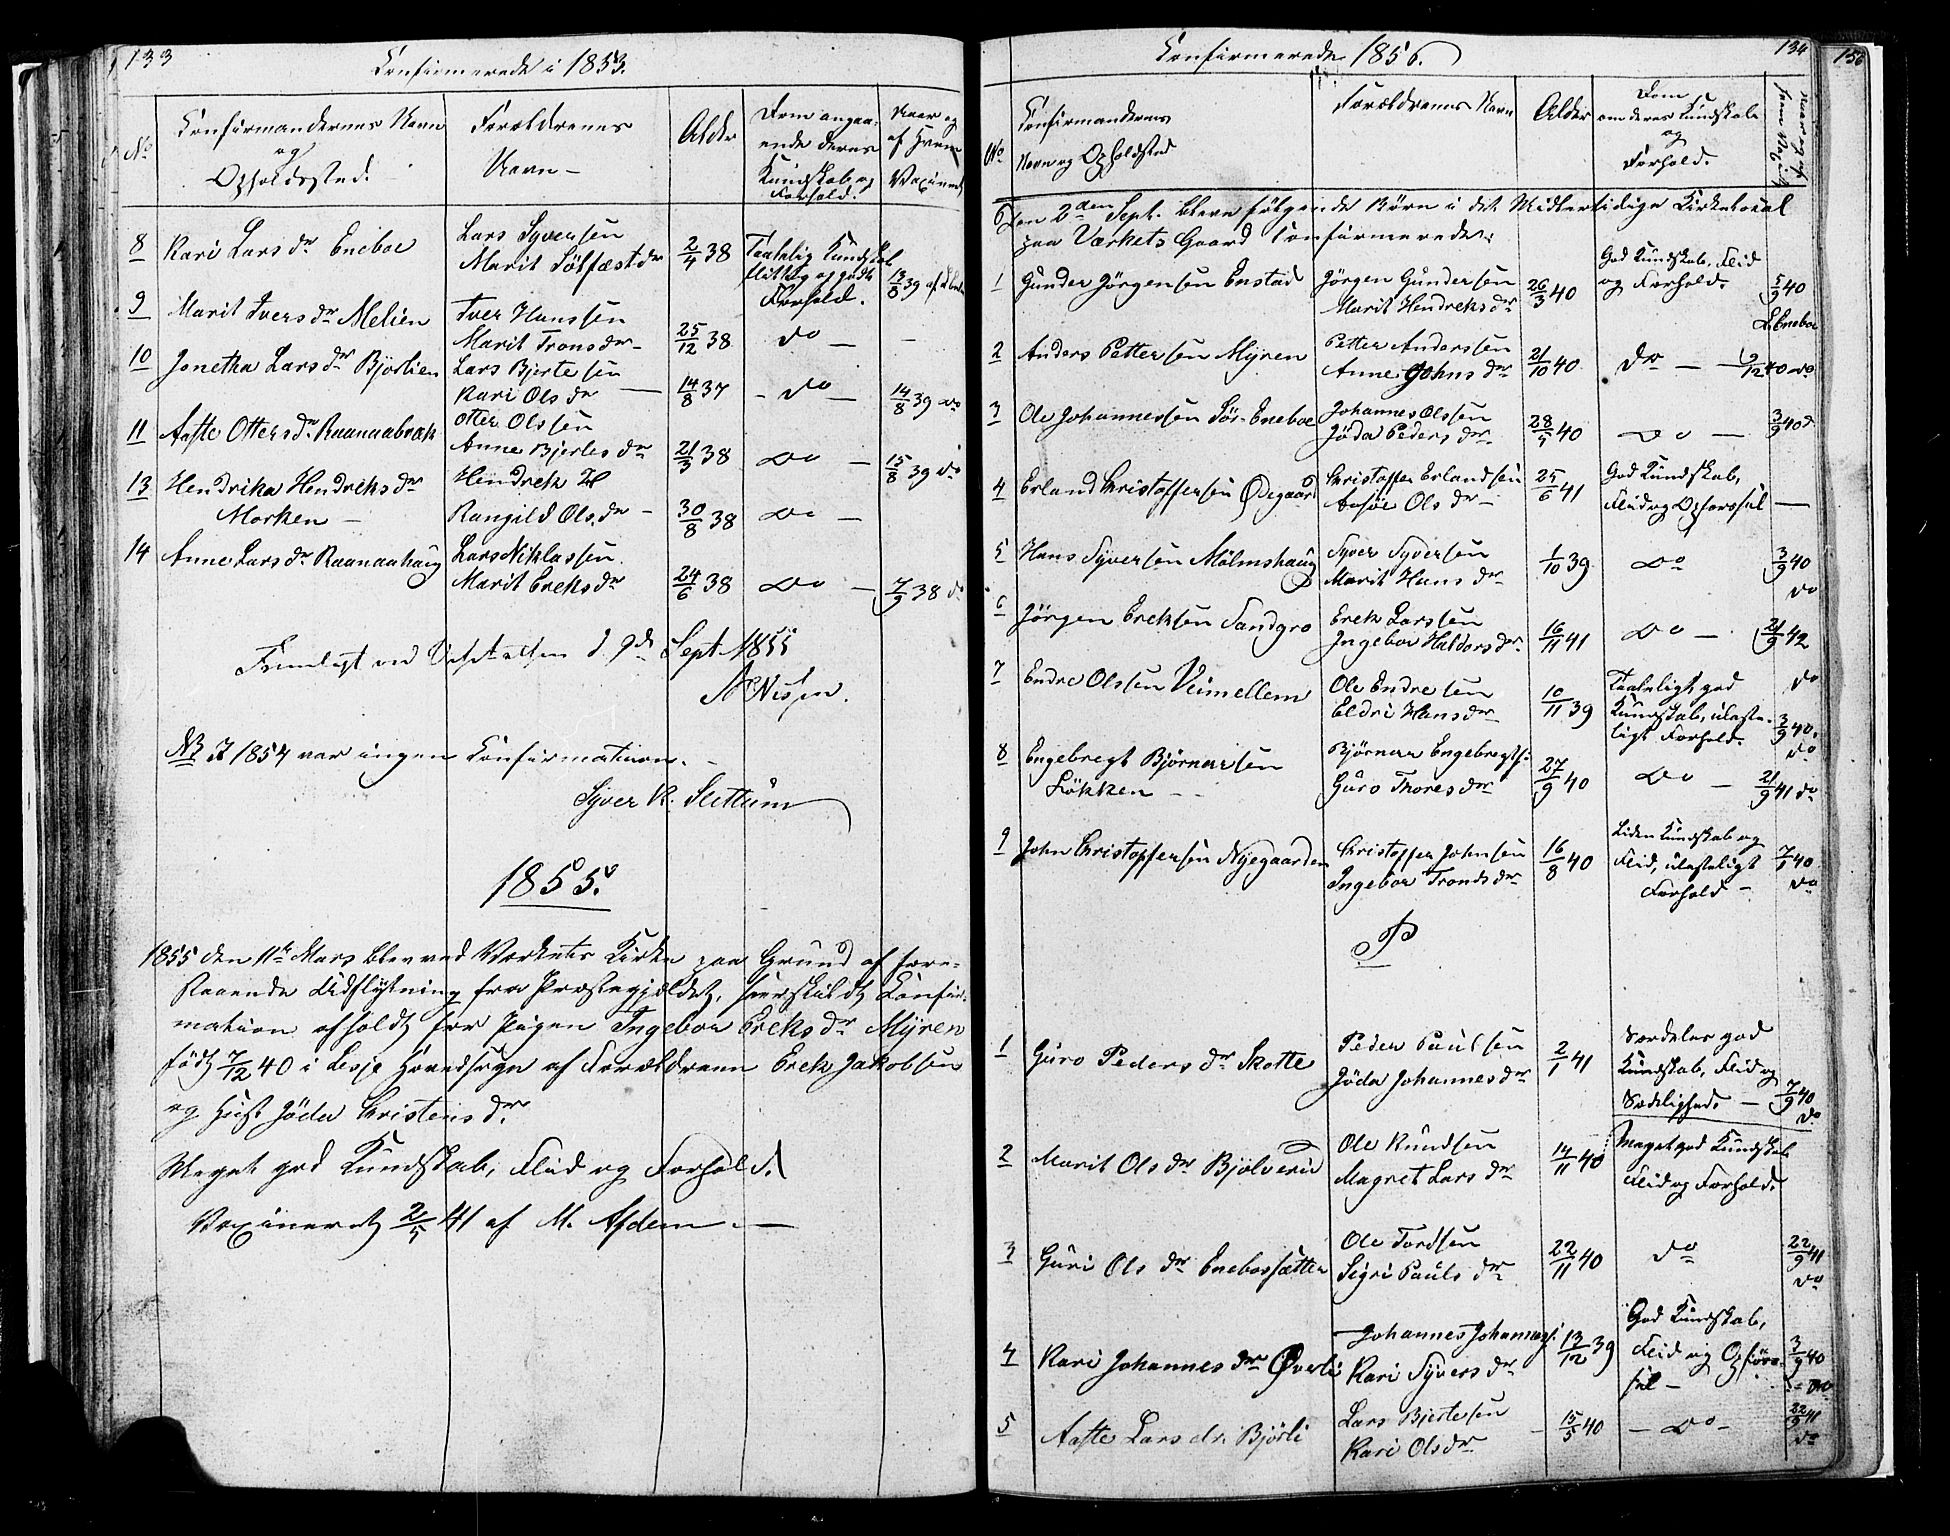 SAH, Lesja prestekontor, Klokkerbok nr. 4, 1842-1871, s. 133-134